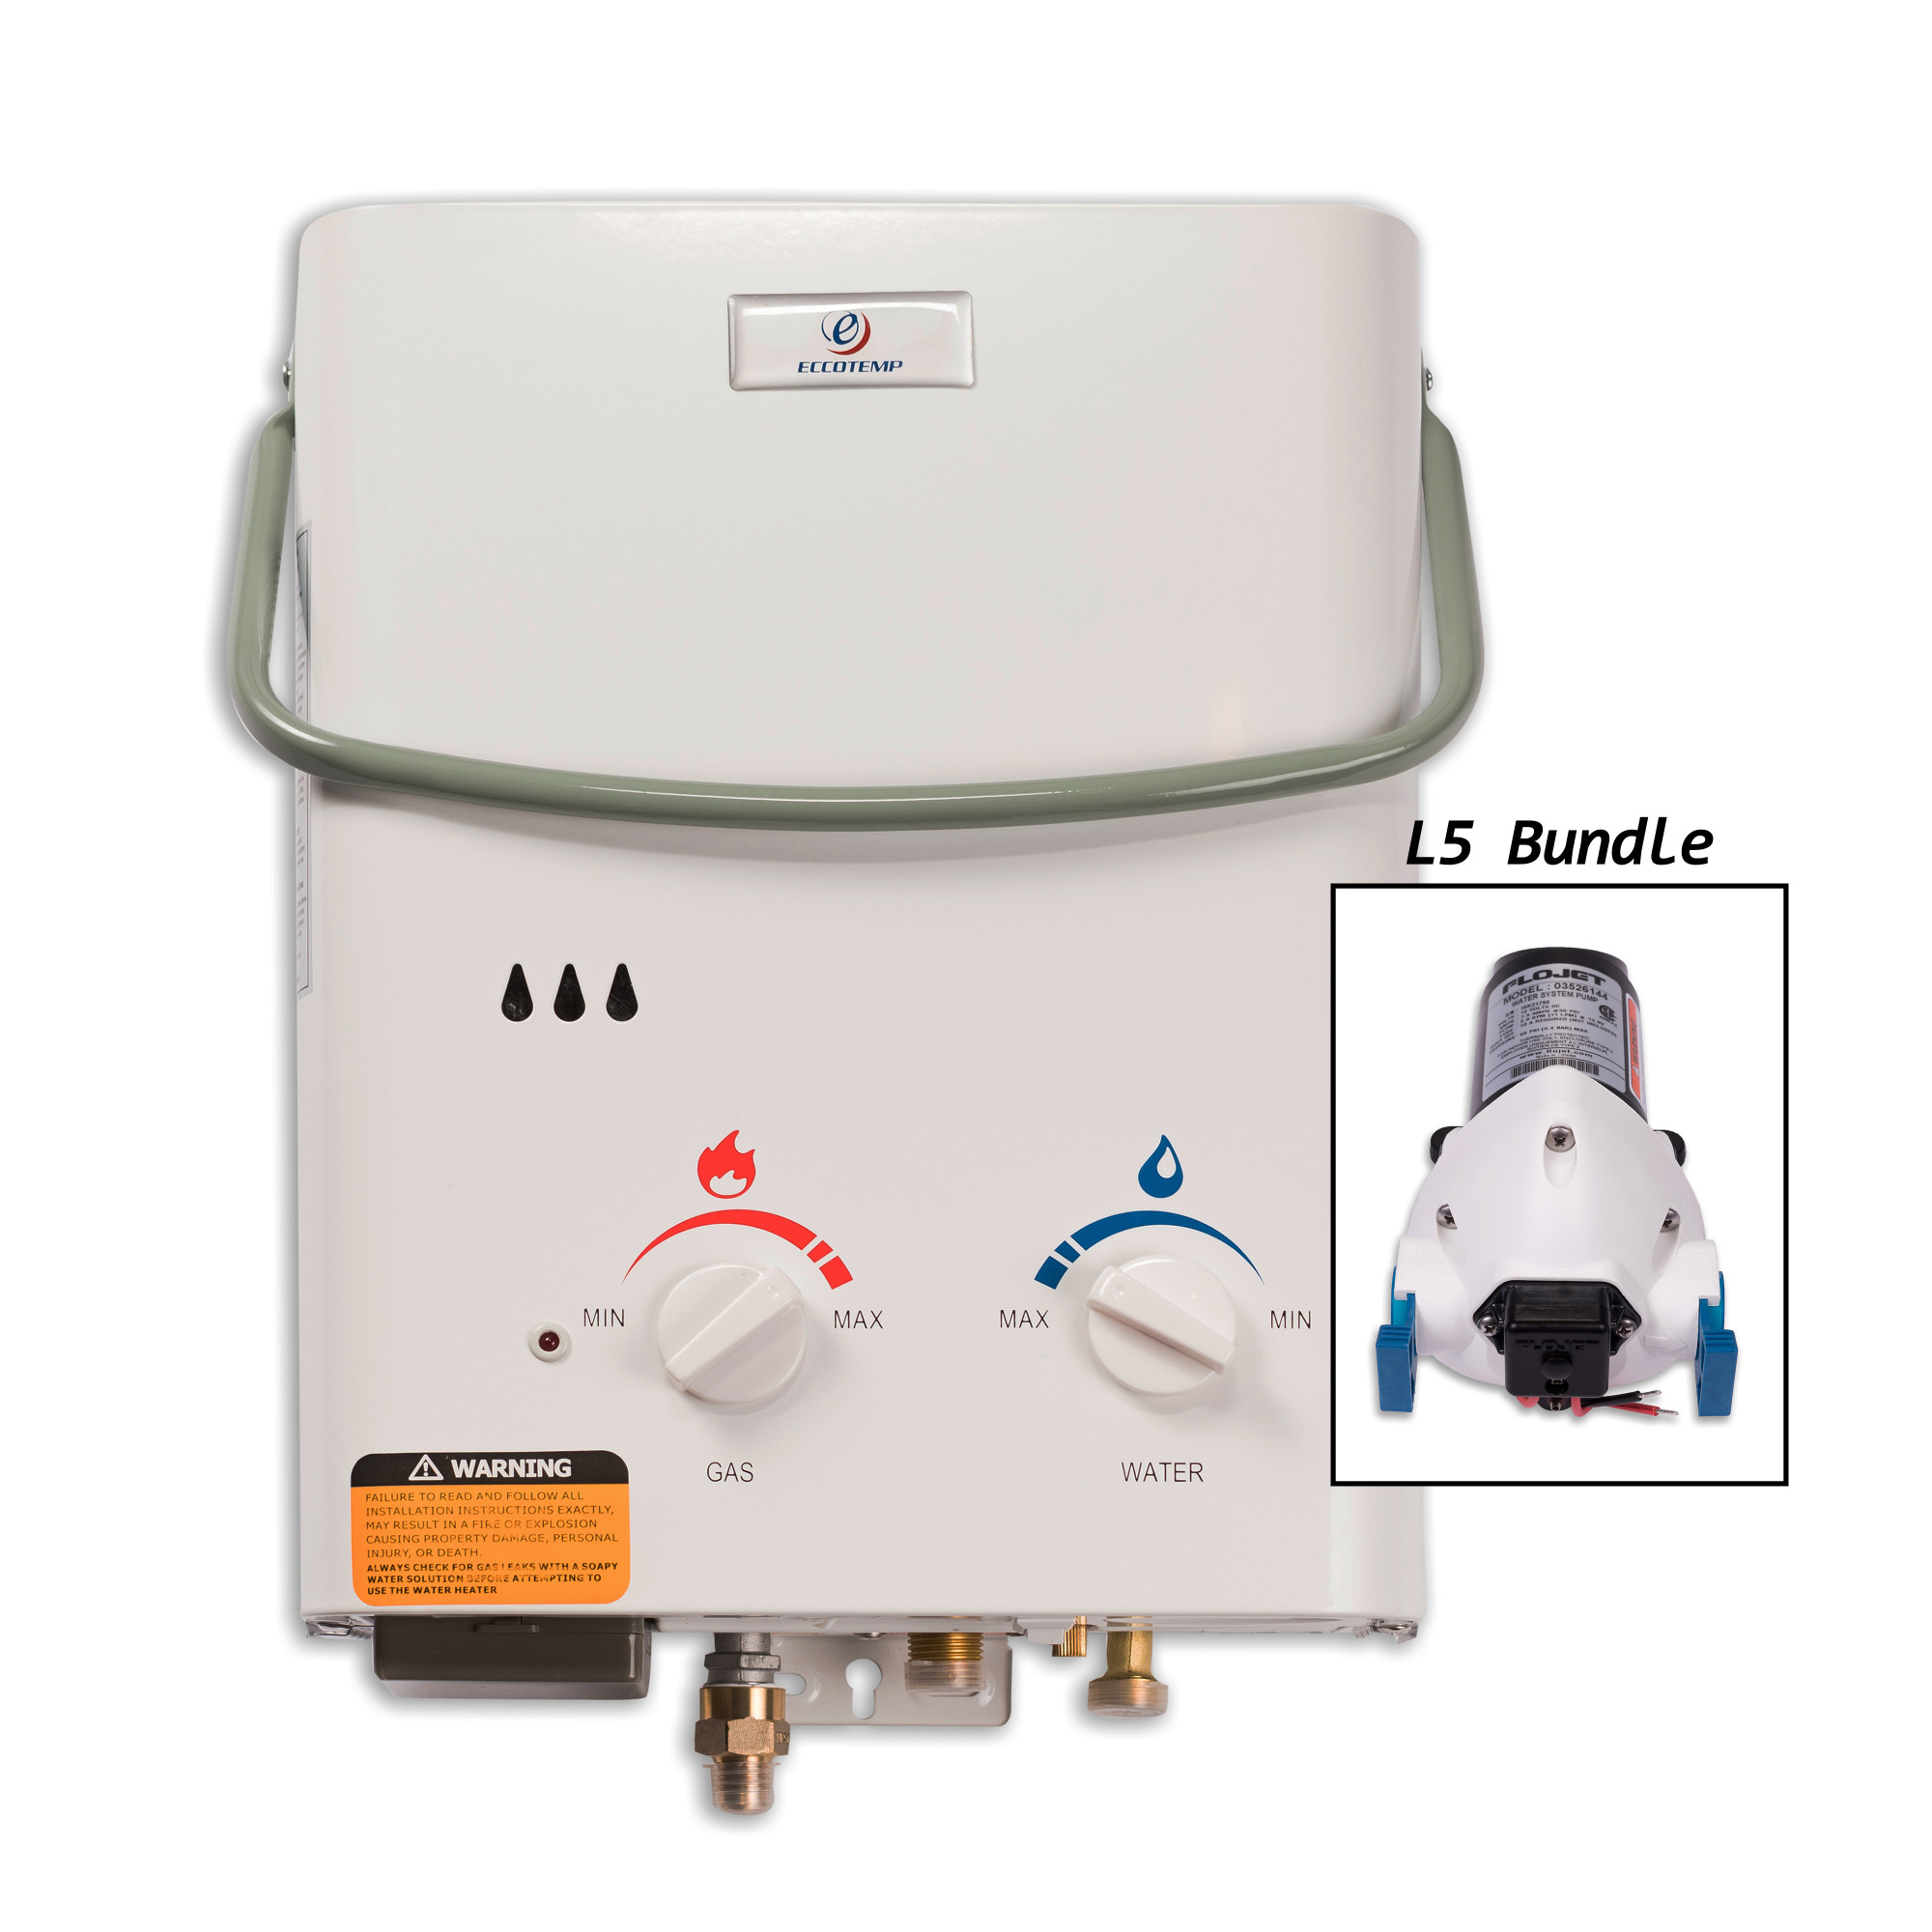 Eccotemp L5-P 1.5 Gallon 11 Kilowatt Portable Liquid Propane Tankless Water Heater with 37,500 Maximum BTU Input and Flojet Pump